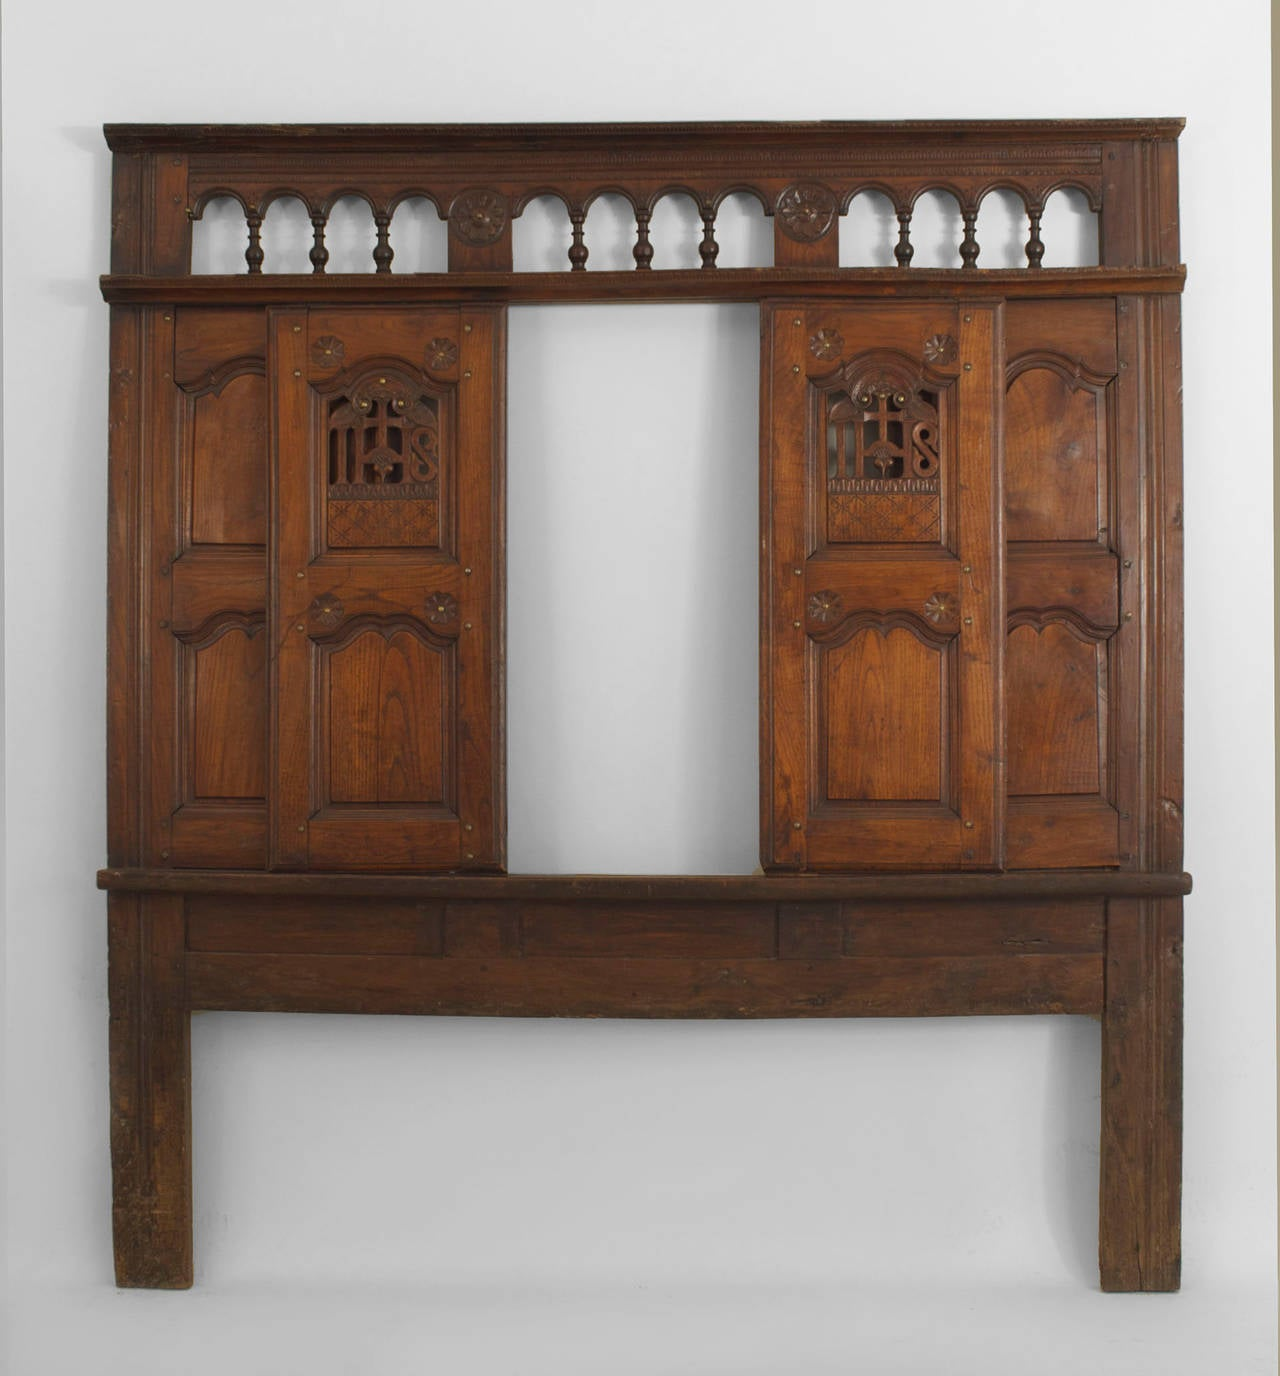 18th Century Italian Renaissance Headboard Originally From Walnut Confessional For Sale At 1stdibs